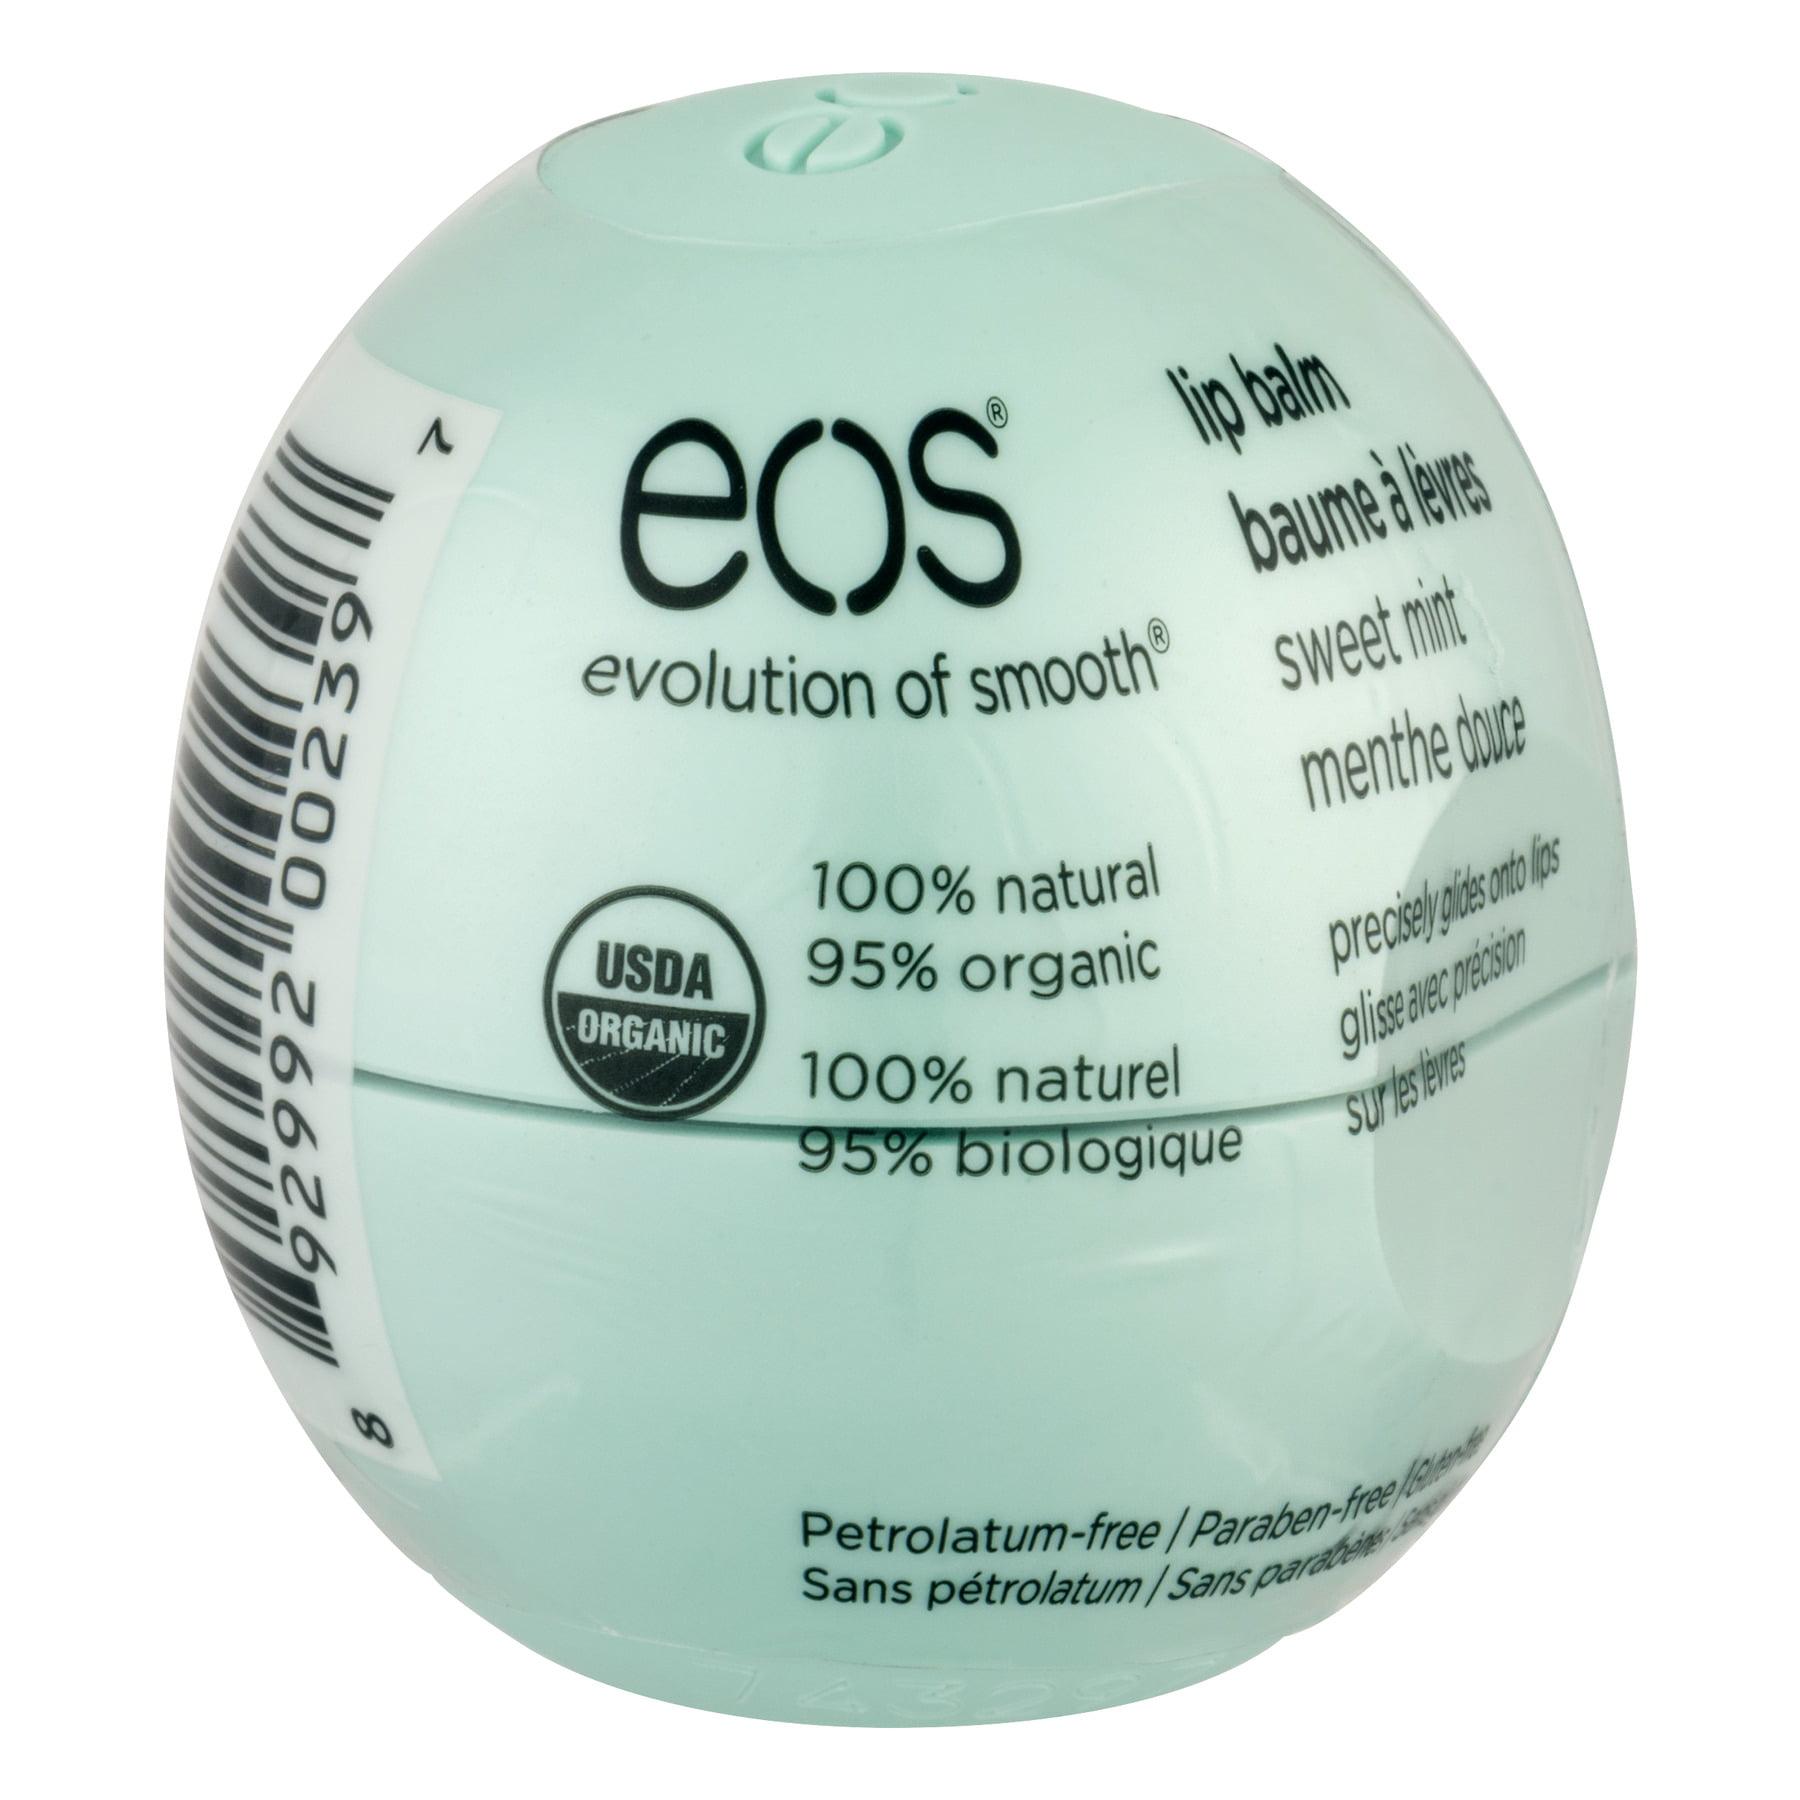 eos Organic Sweet Mint Lip Balm, 0.25oz